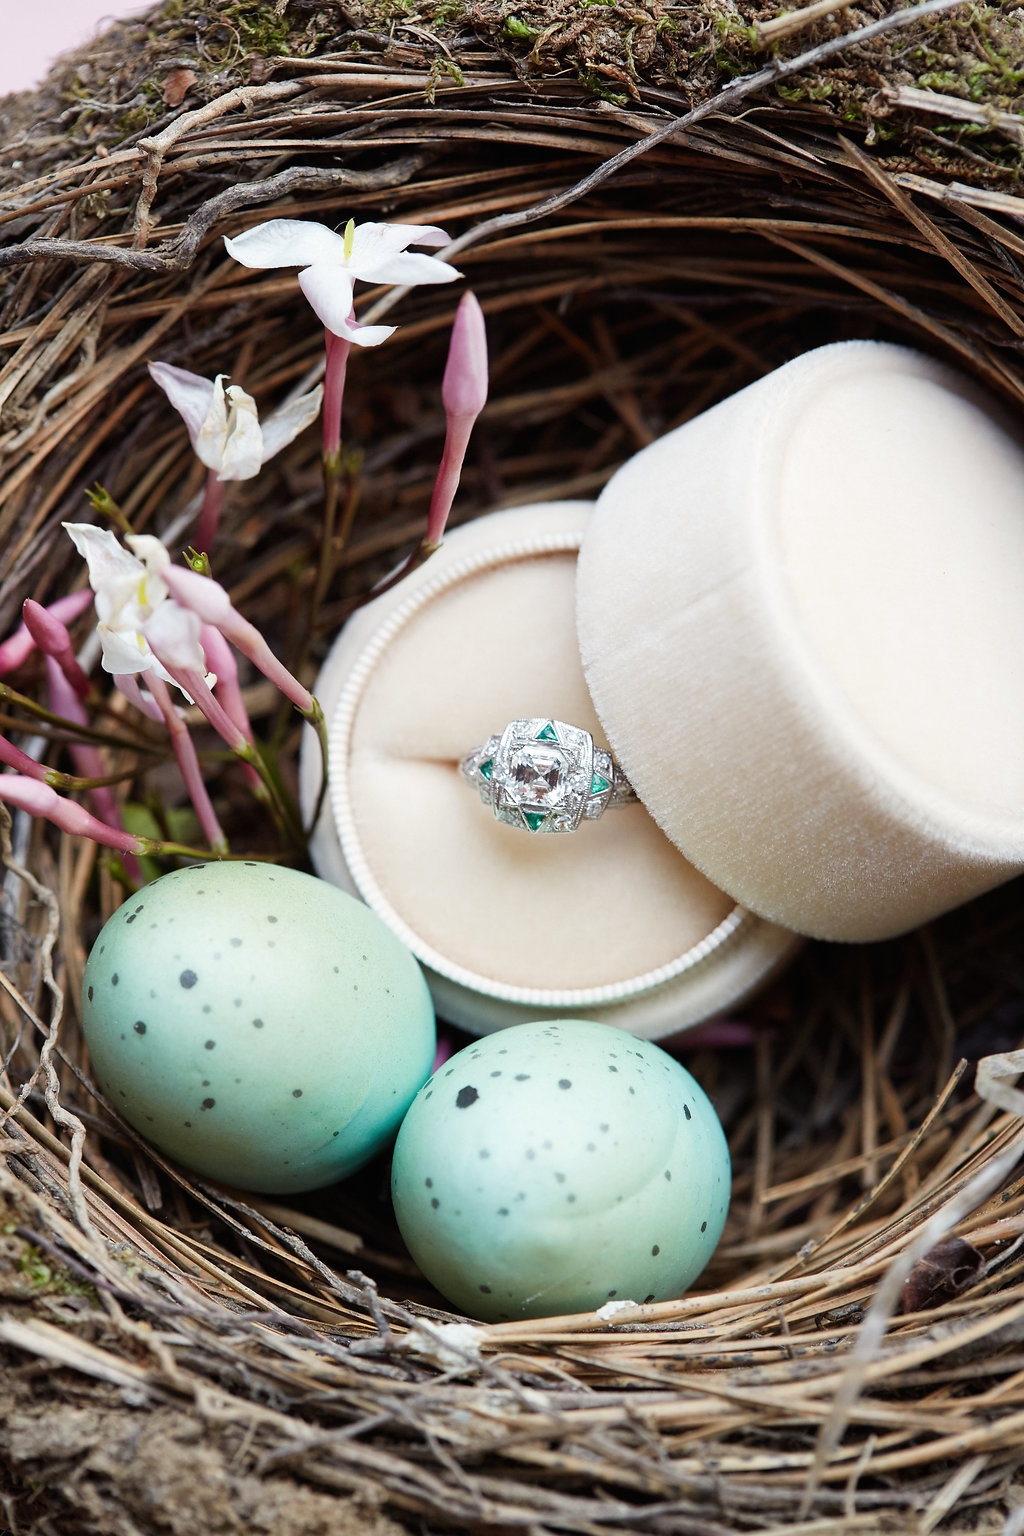 amonié-ring-boxes-wedding-engagement-artist-profile-7-unearthing.tc.jpg